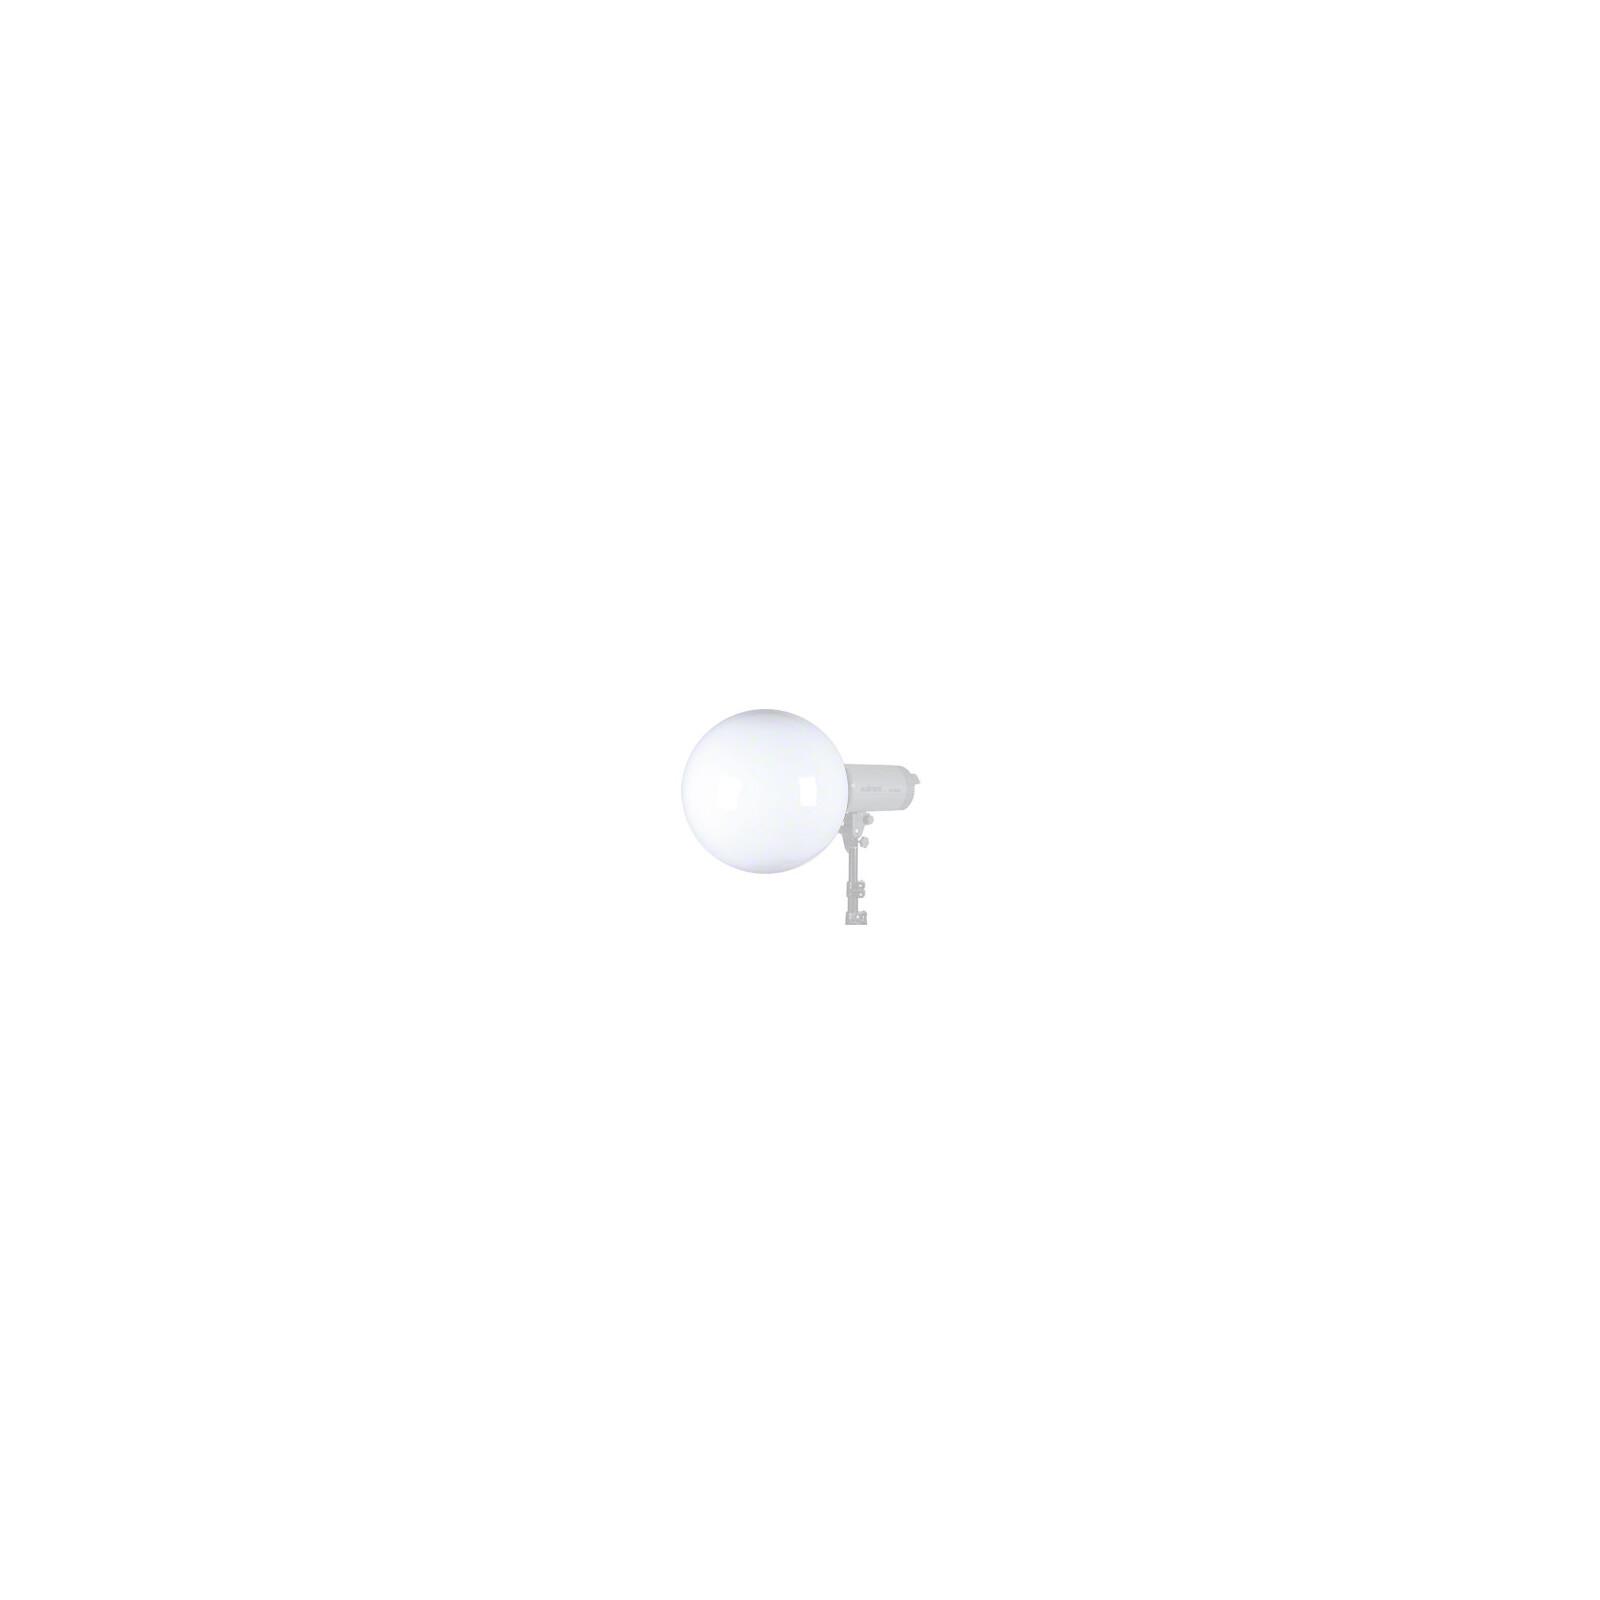 walimex Universal Diffusorkugel, 30cm Balcar